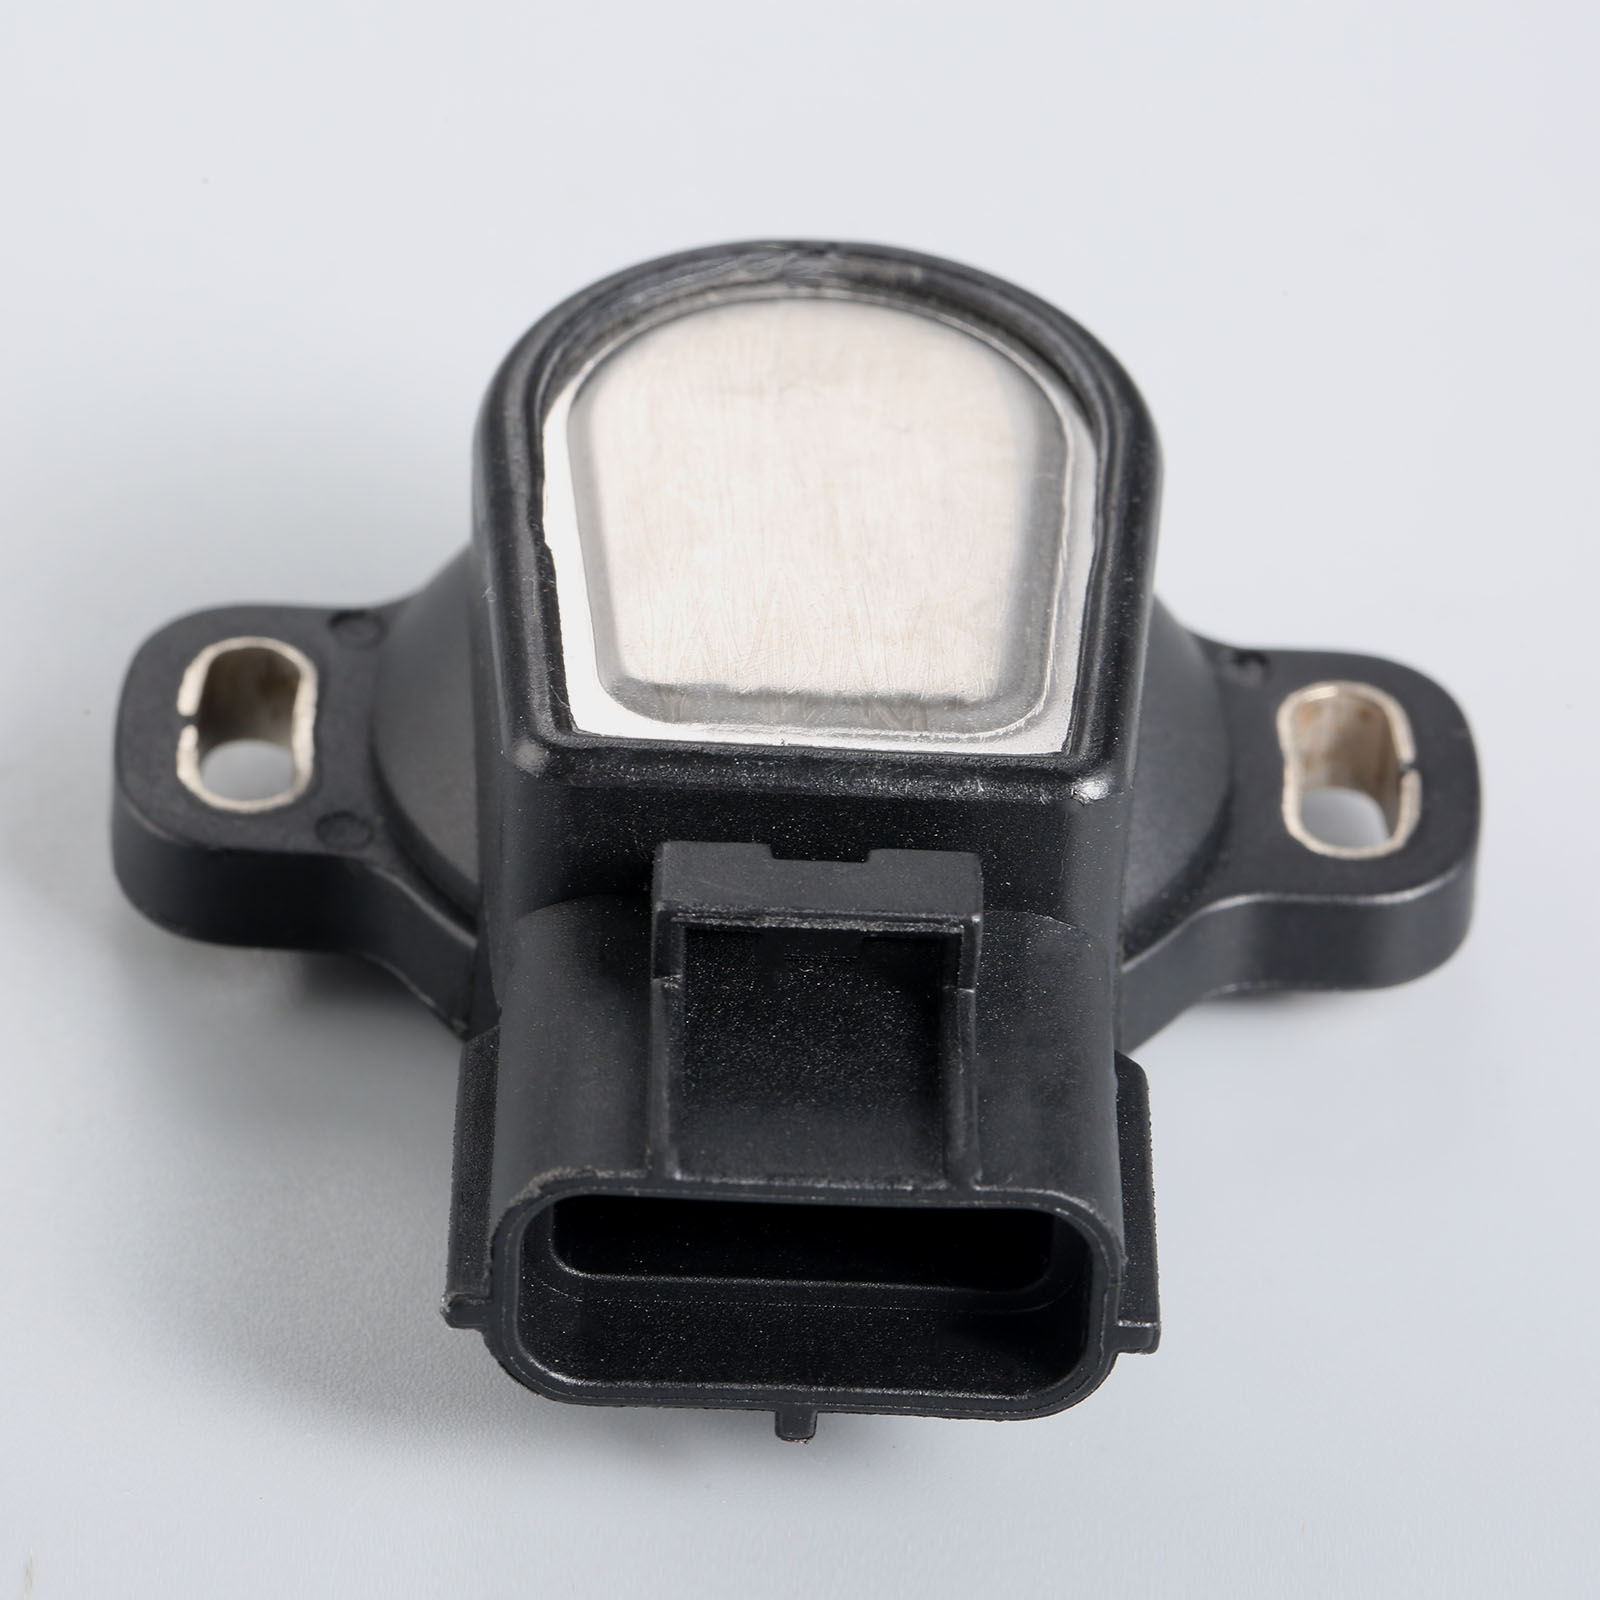 Throttle Position Sensor 89452-22080 for Tacoma 1995-1998 DLX SR5 4 Cyl 2.4